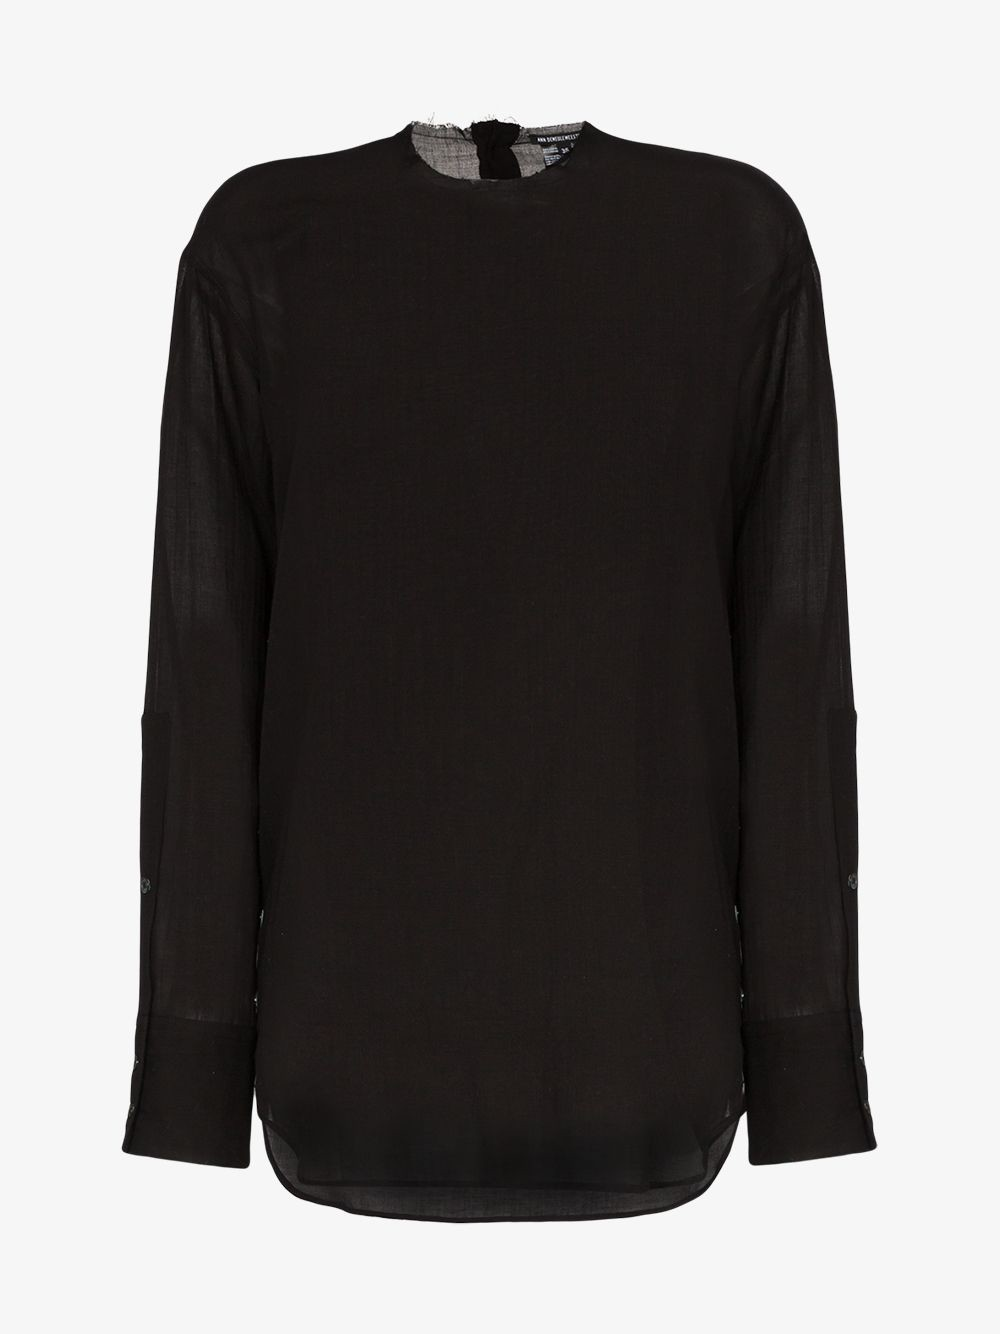 Ann Demeulemeester Relaxed fit long-sleeve sheer cashmere blend T-shirt in black